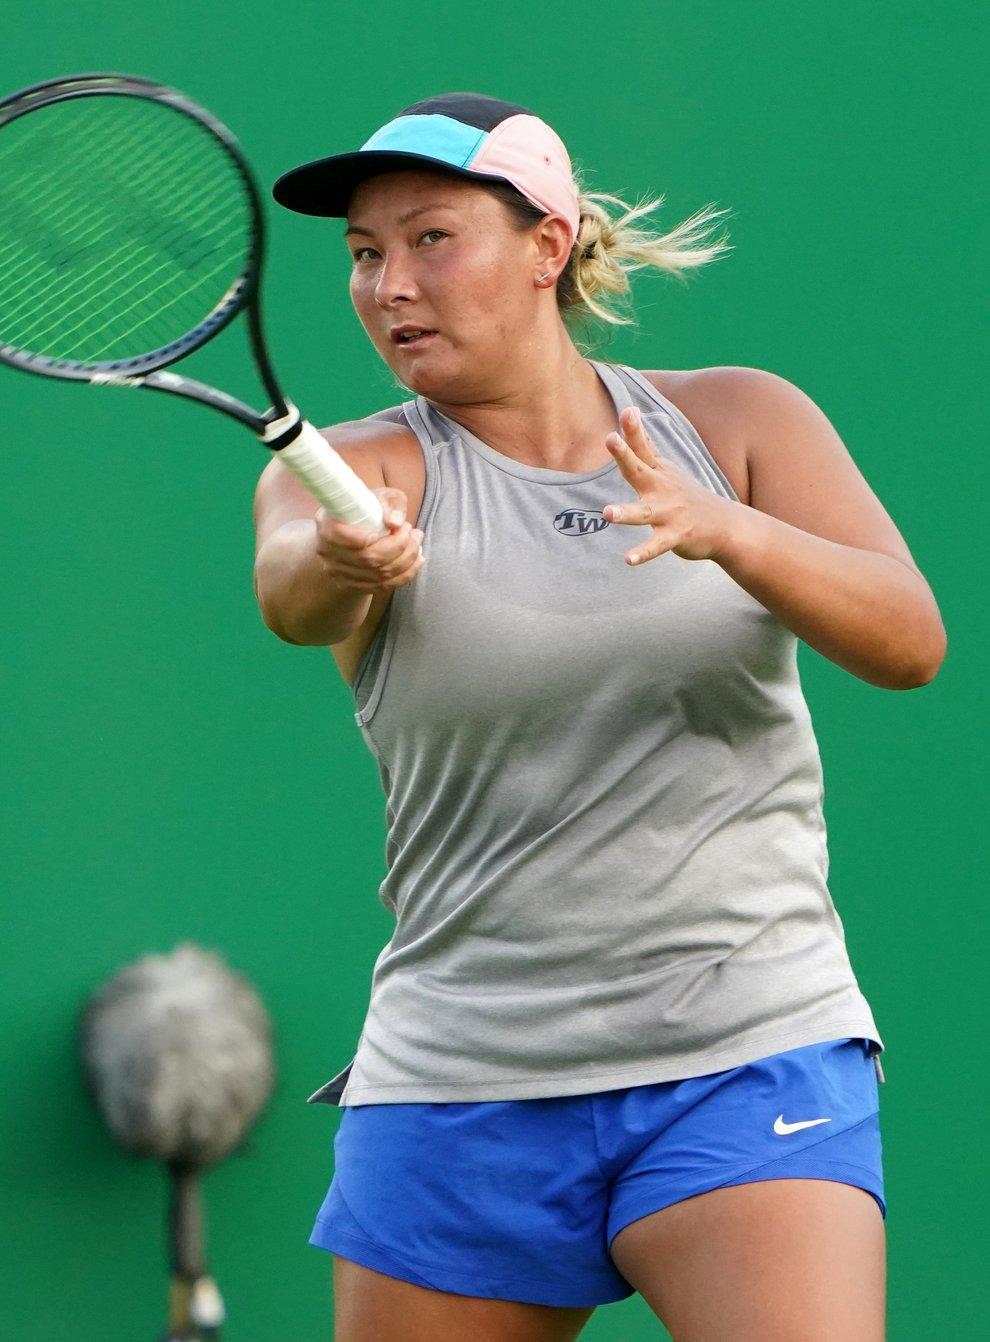 Tara Moore won her first WTA Tour level match since 2016